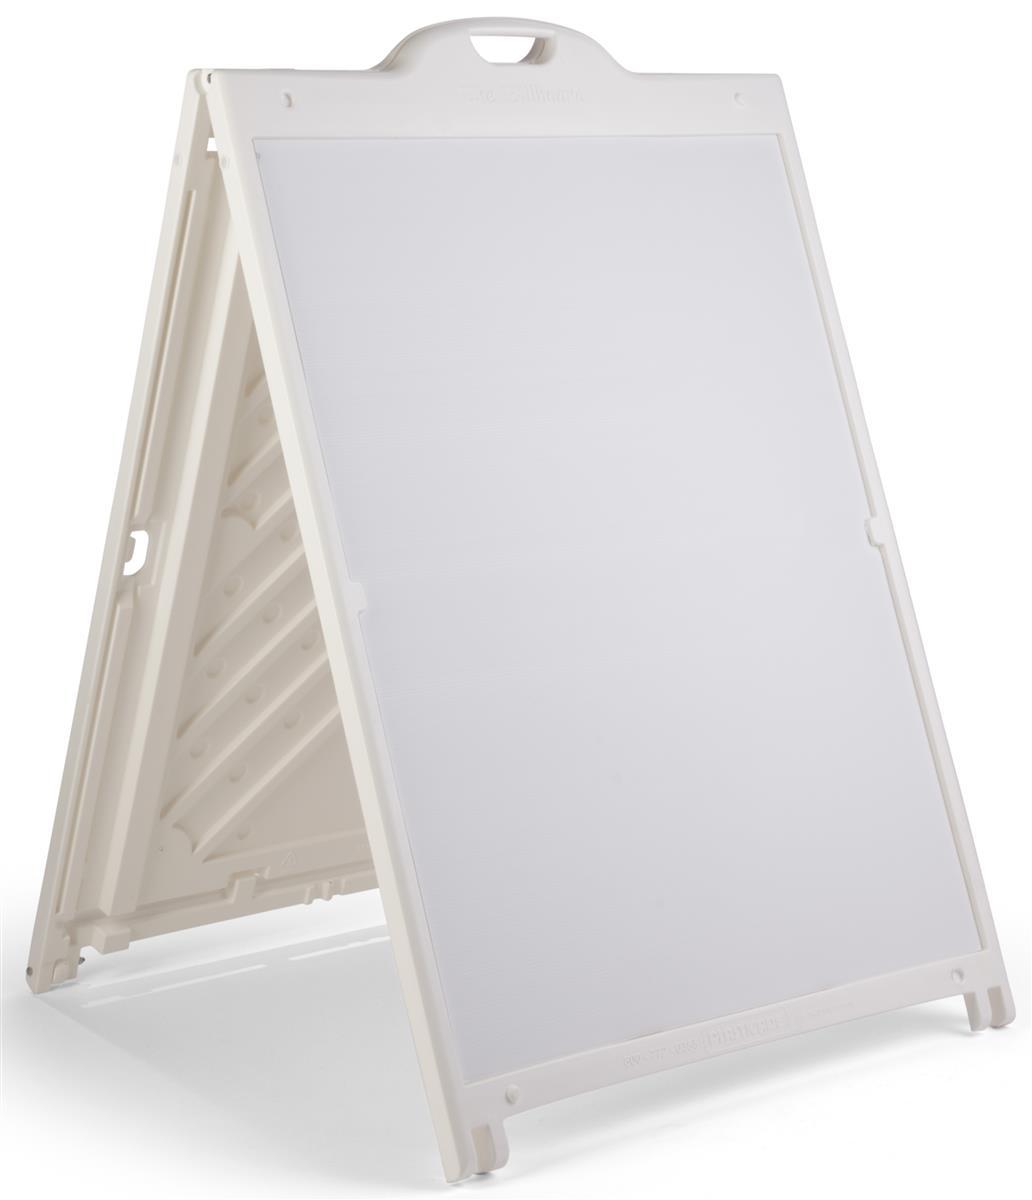 36 X 48 Plastic Sandwich Board 2 Coroplast 174 Inserts